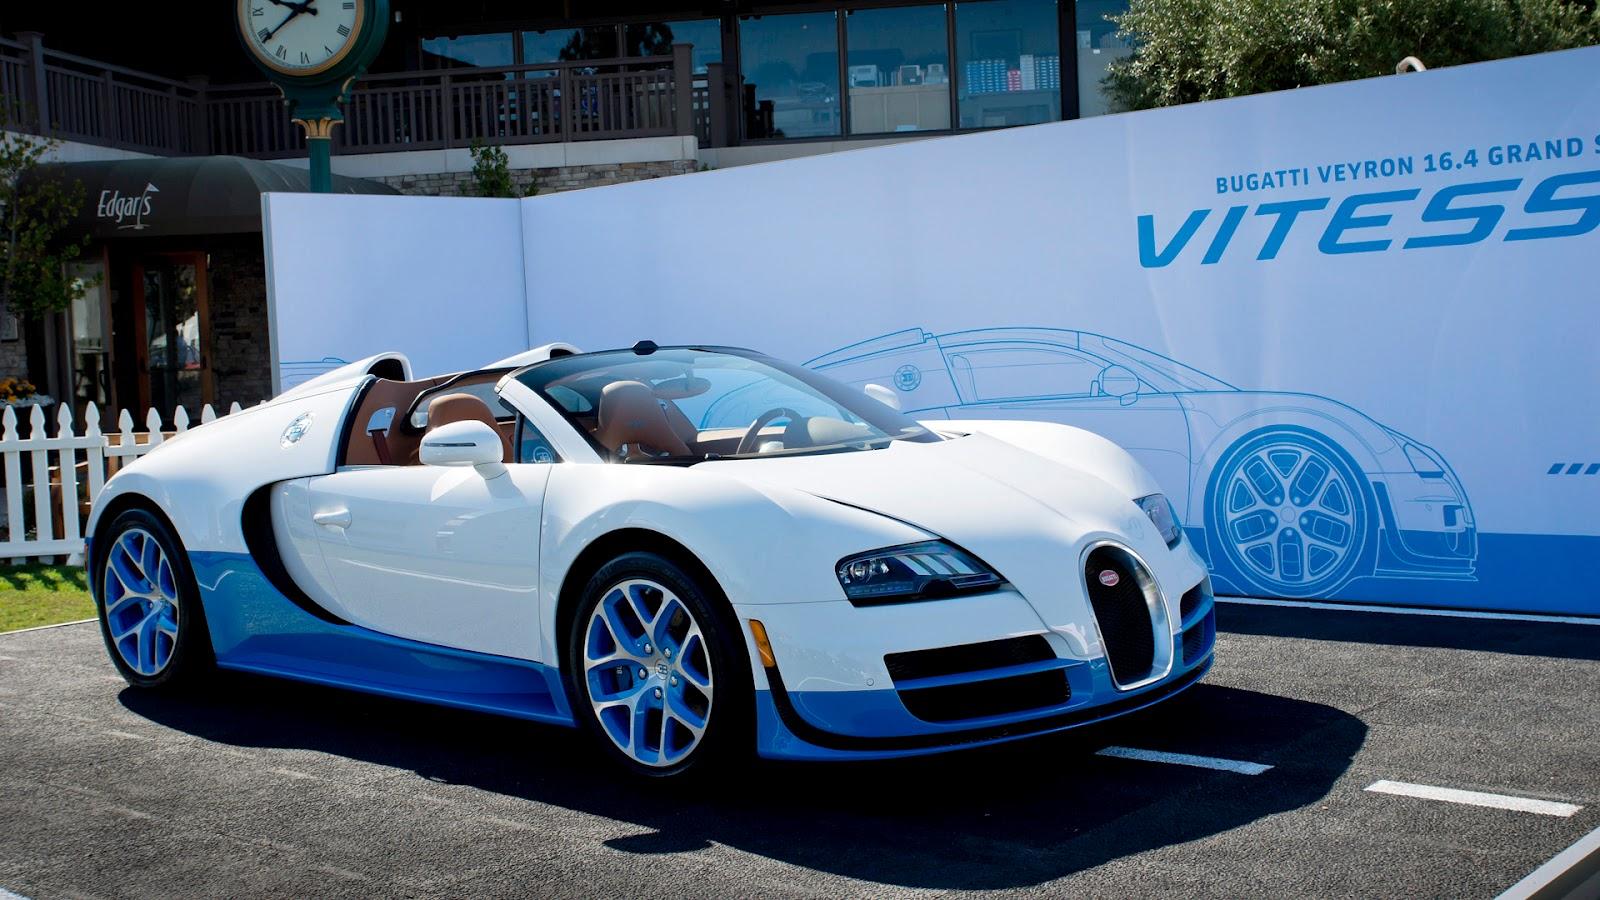 car wallpapers free download 2012 bugatti veyron grand. Black Bedroom Furniture Sets. Home Design Ideas